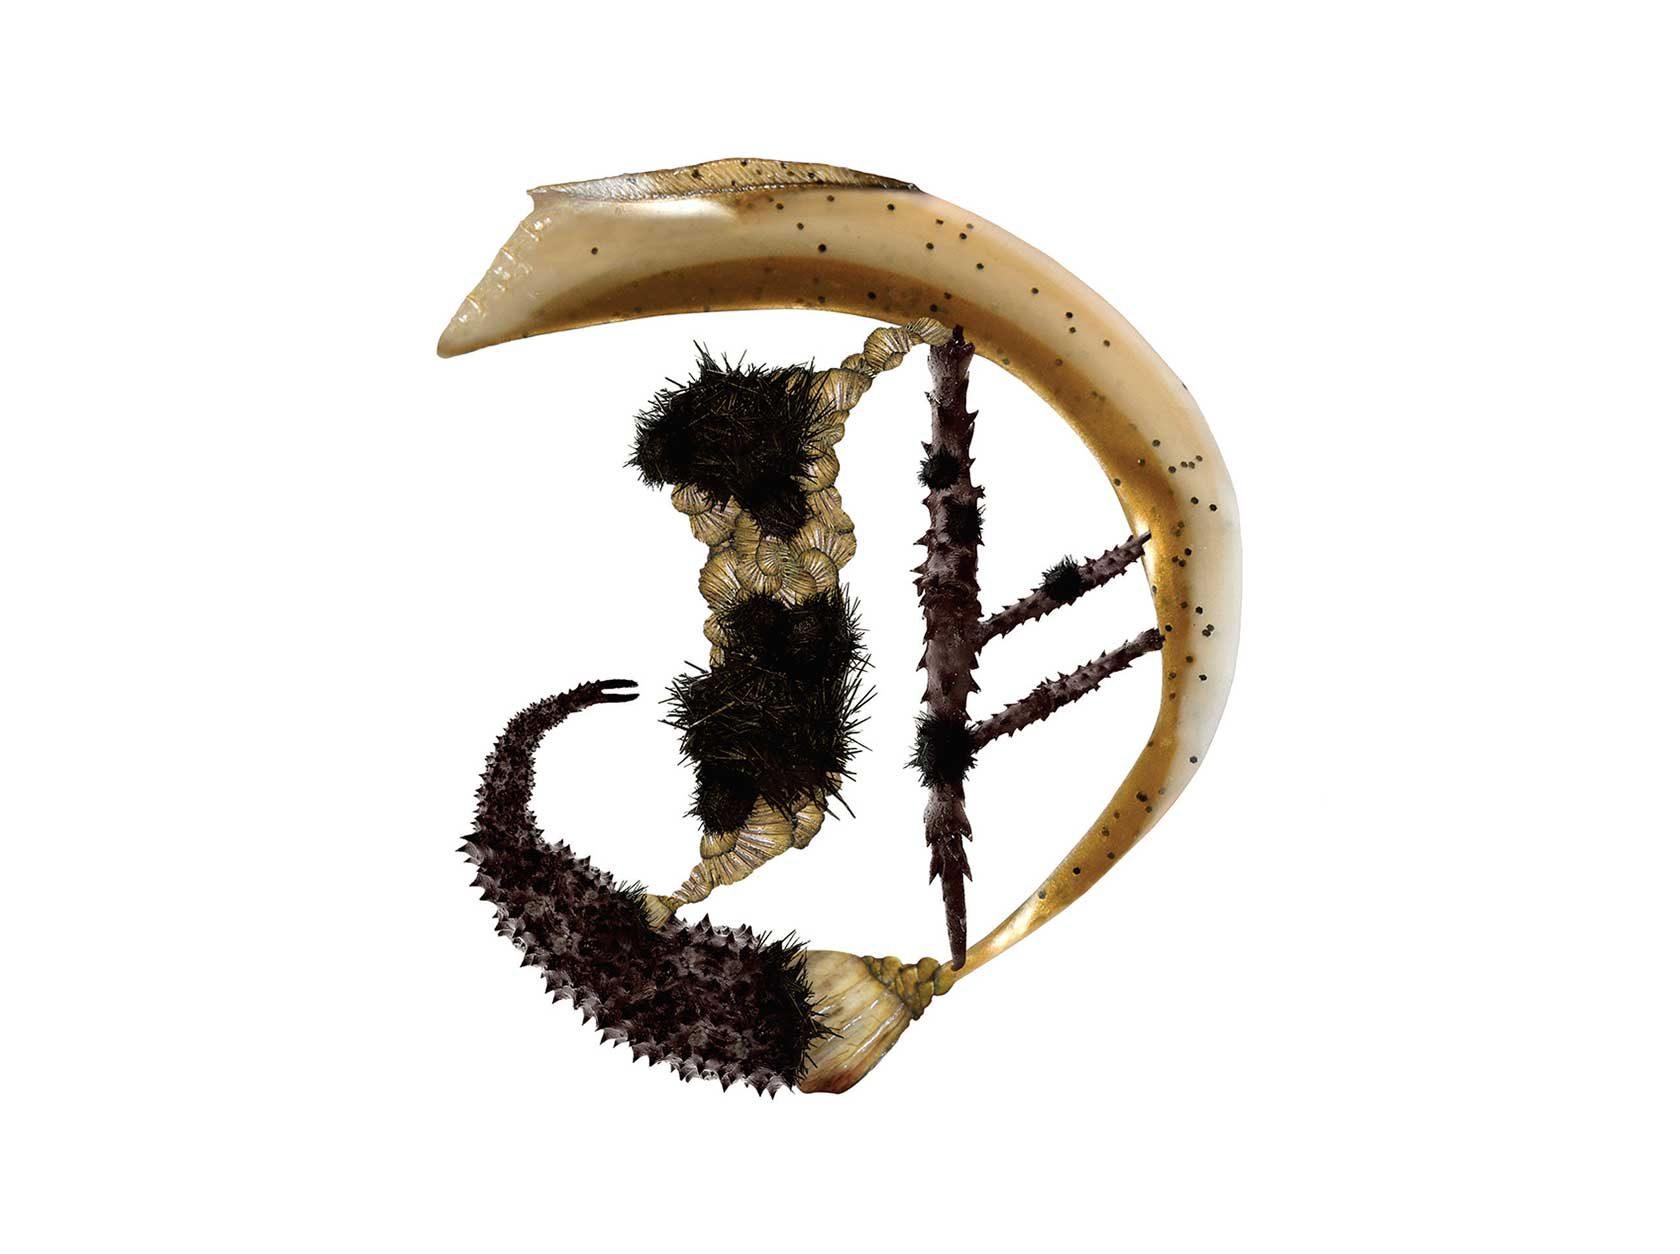 Bird Headed Monster Letter D3 Design by Furia